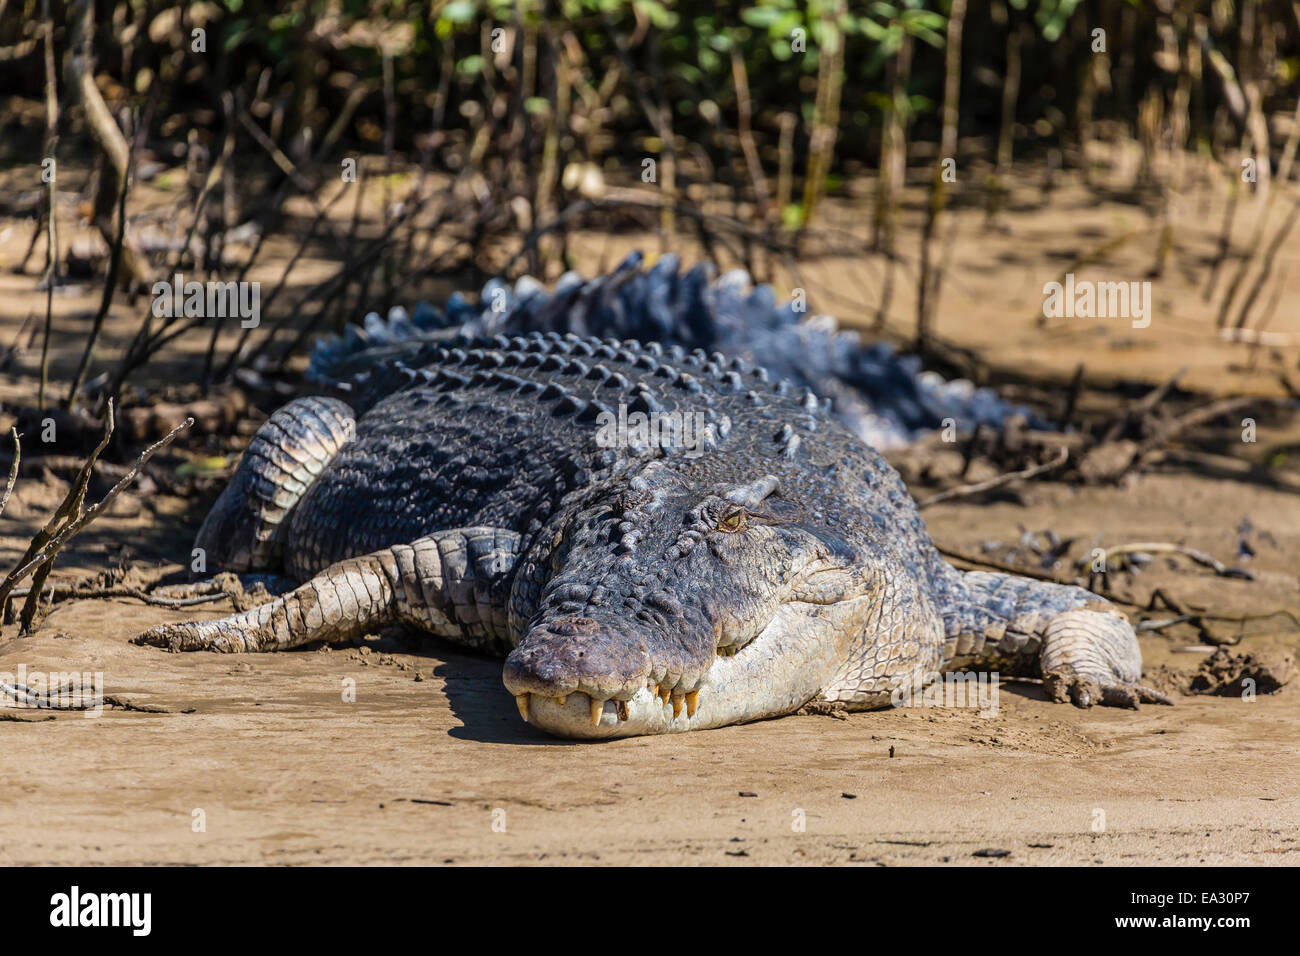 Adult saltwater crocodile (Crocodylus porosus), on the banks of the Daintree River, Daintree rain forest, Queensland, - Stock Image